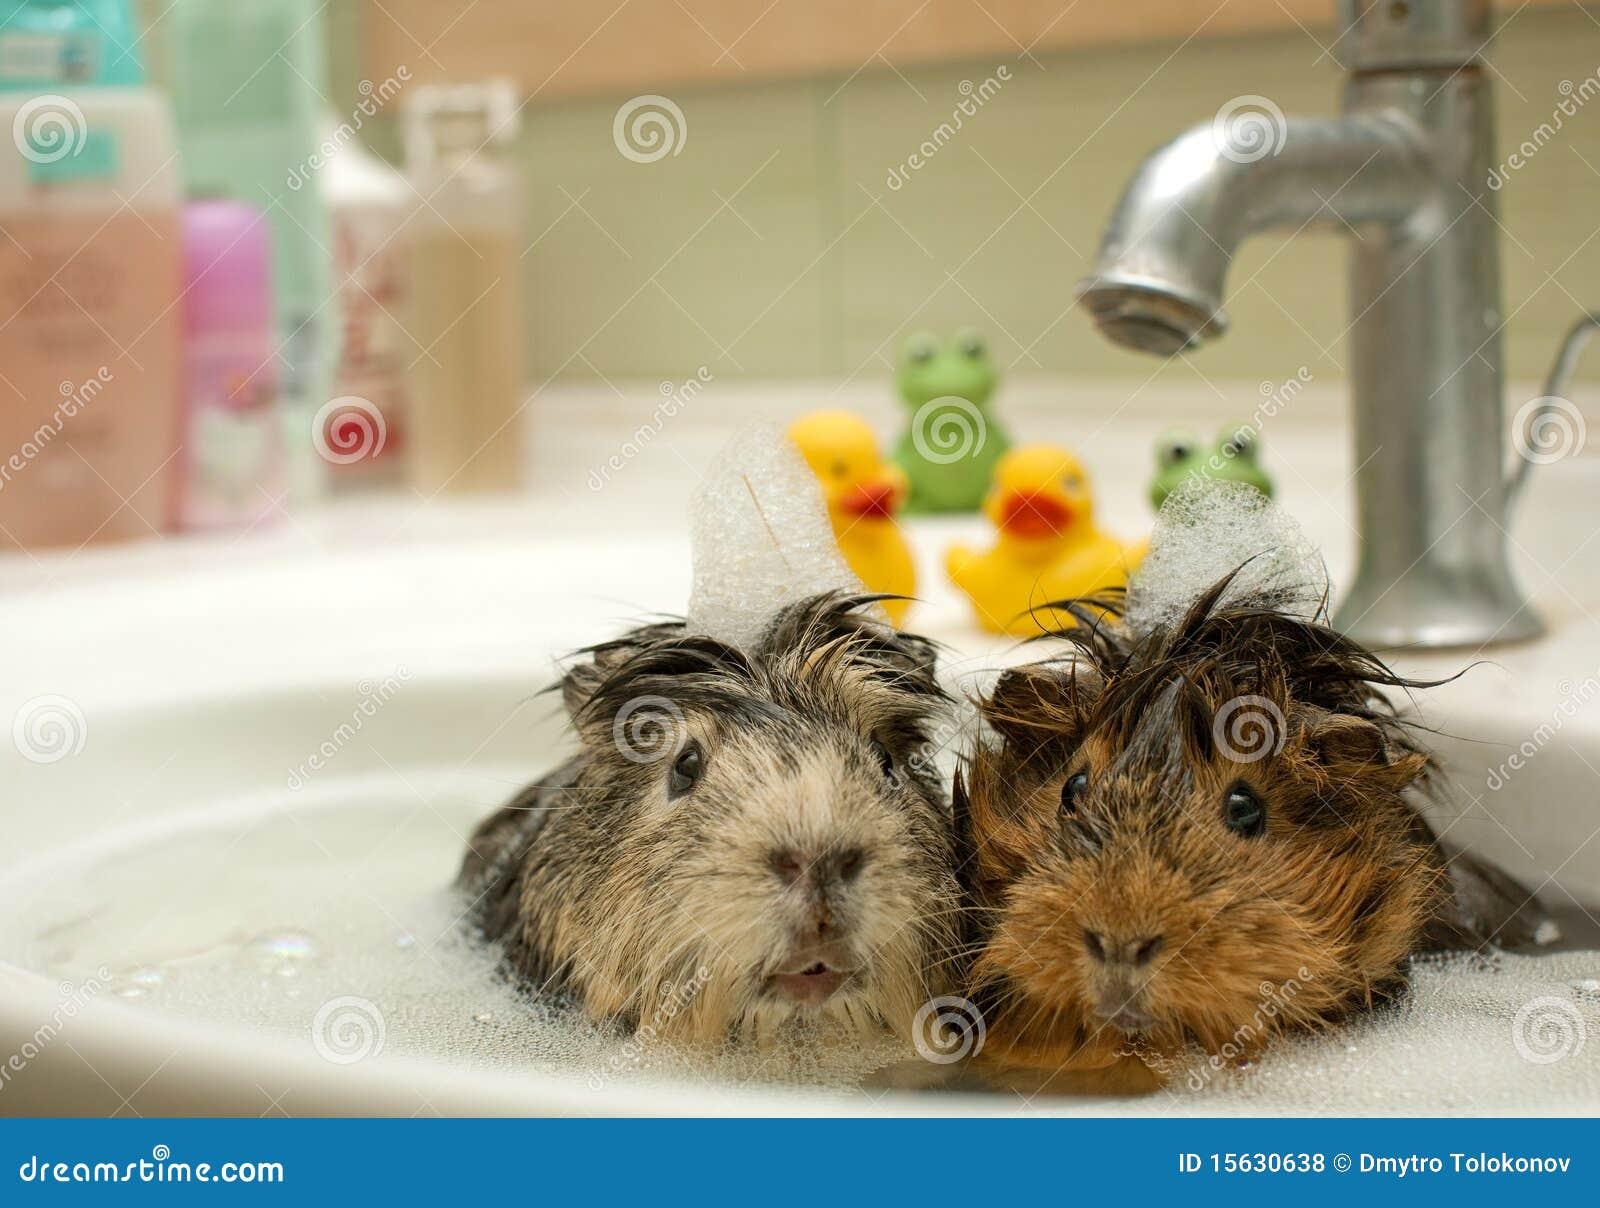 Bekend Grappige dieren stock foto. Afbeelding bestaande uit life - 15630638 @AS11